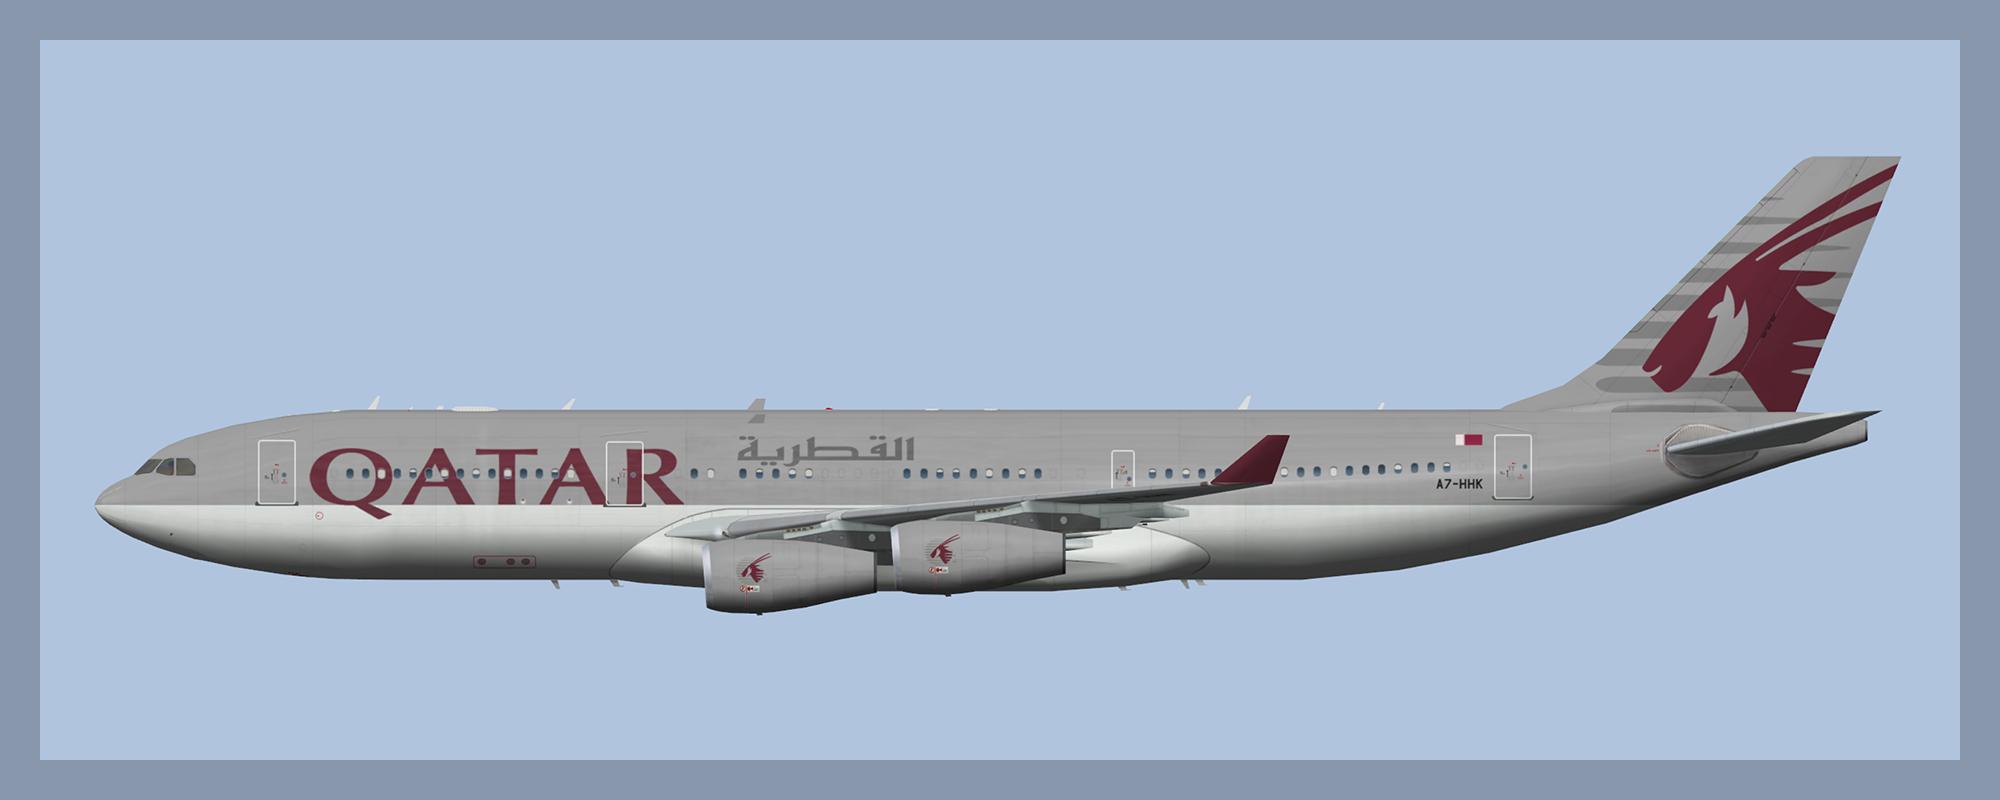 FSP_A342_QAF_A7HHK